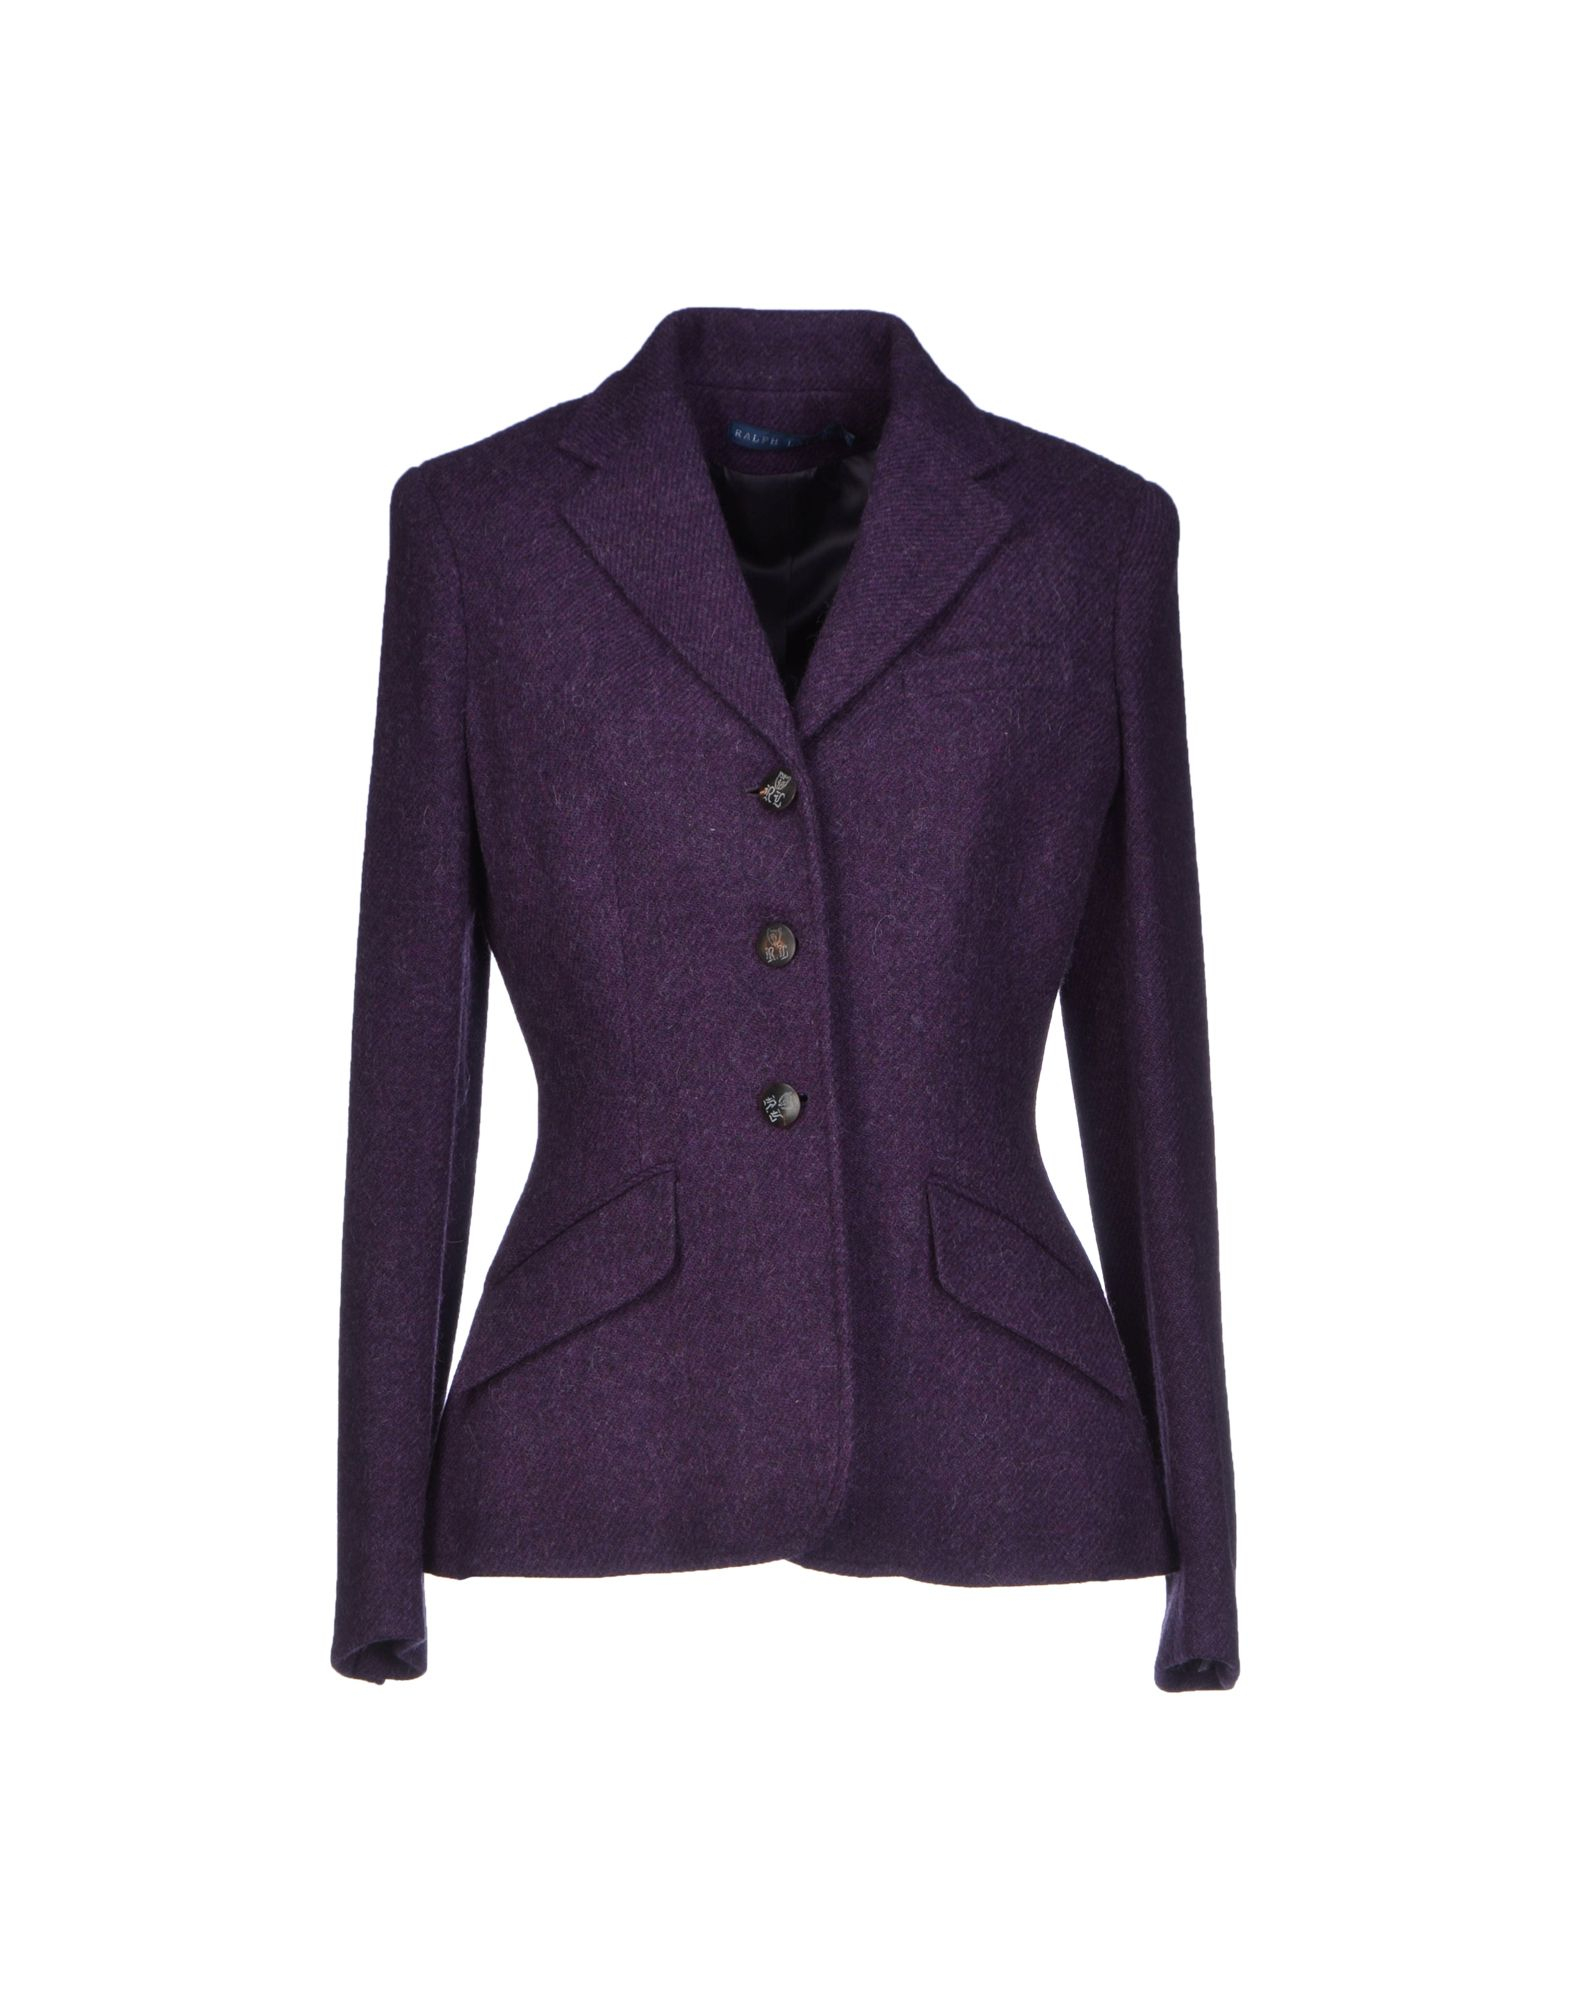 ralph lauren blazer in purple lyst. Black Bedroom Furniture Sets. Home Design Ideas